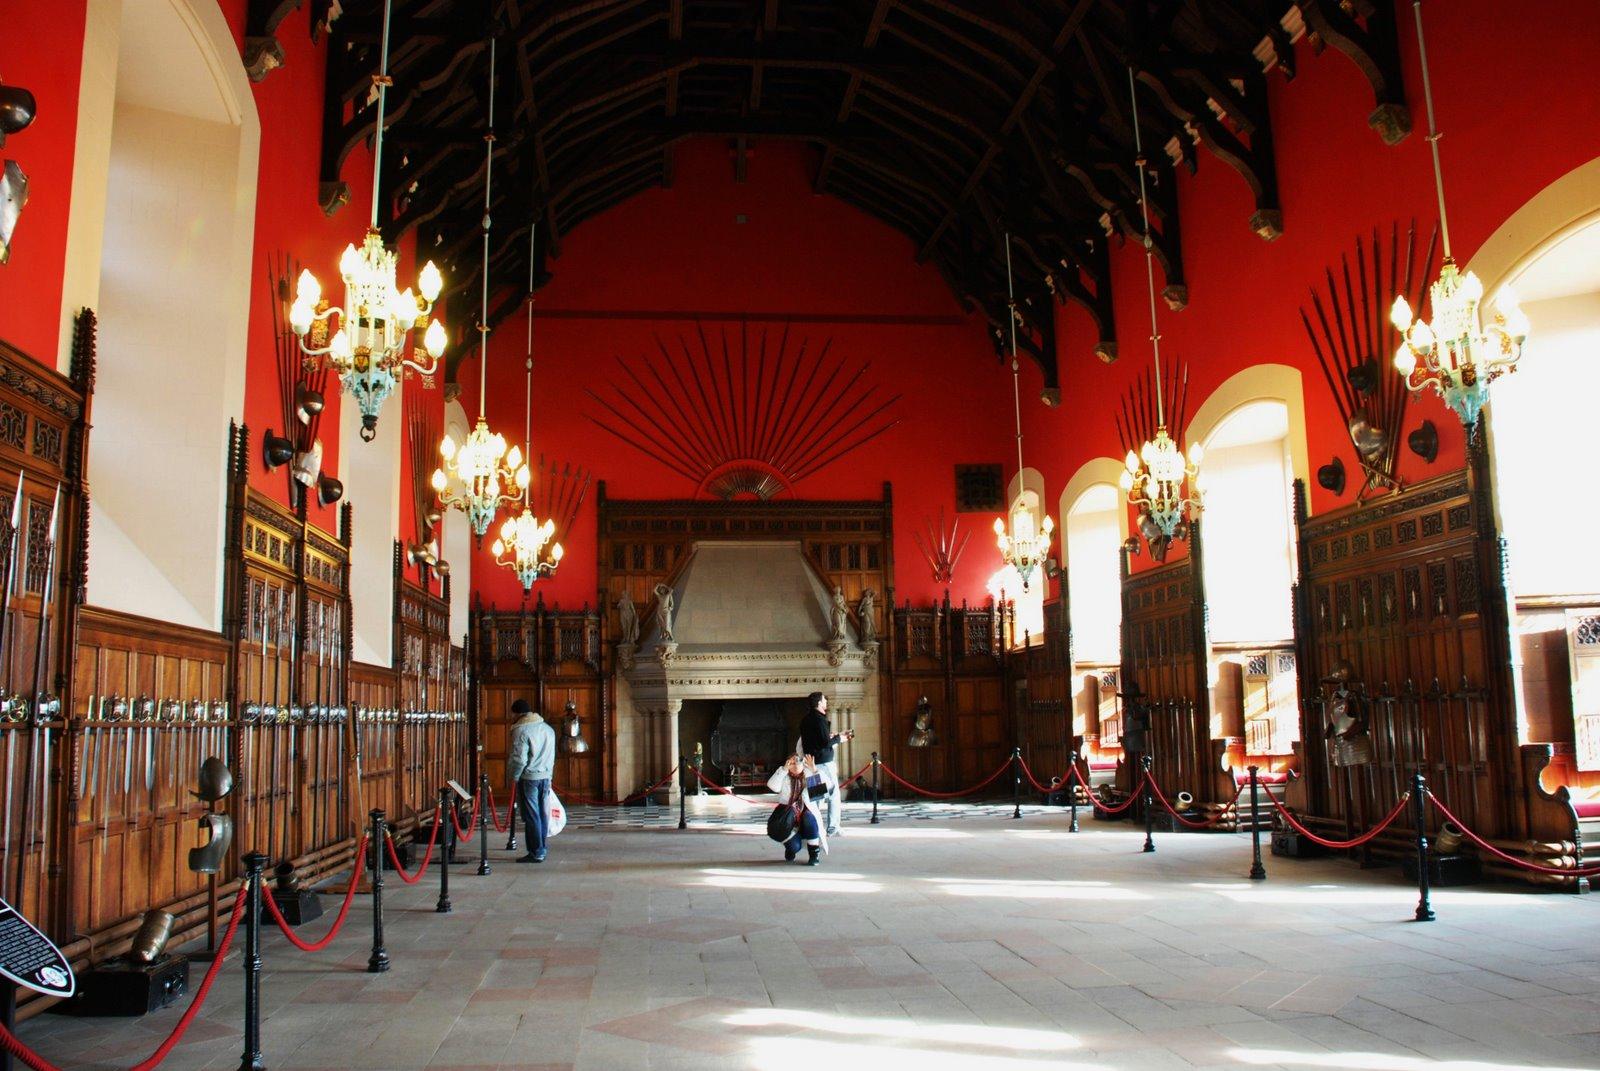 Pics for edinburgh castle inside for Pictures inside